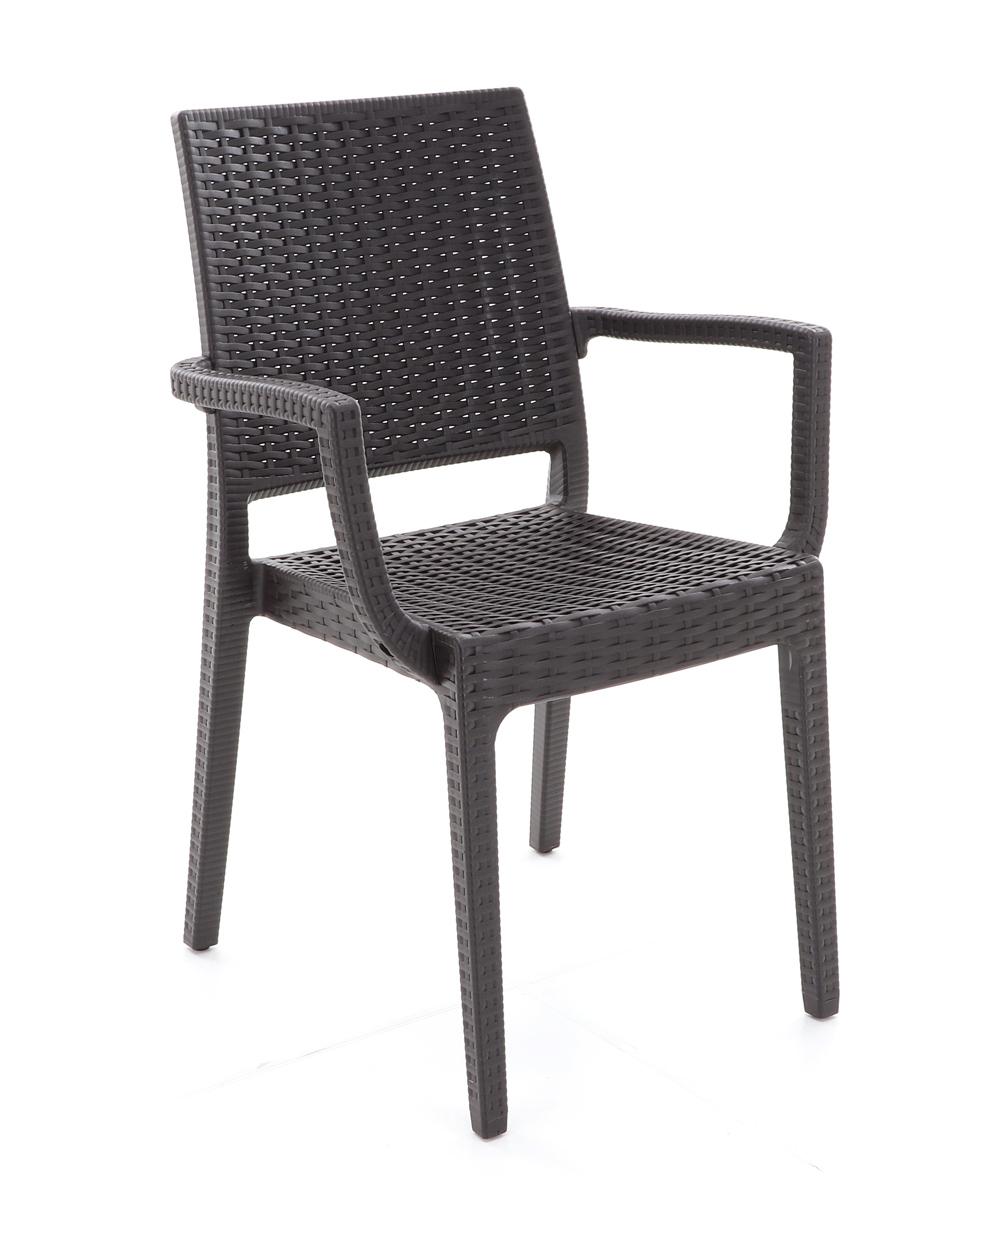 Záhradná stolička SIBILLA